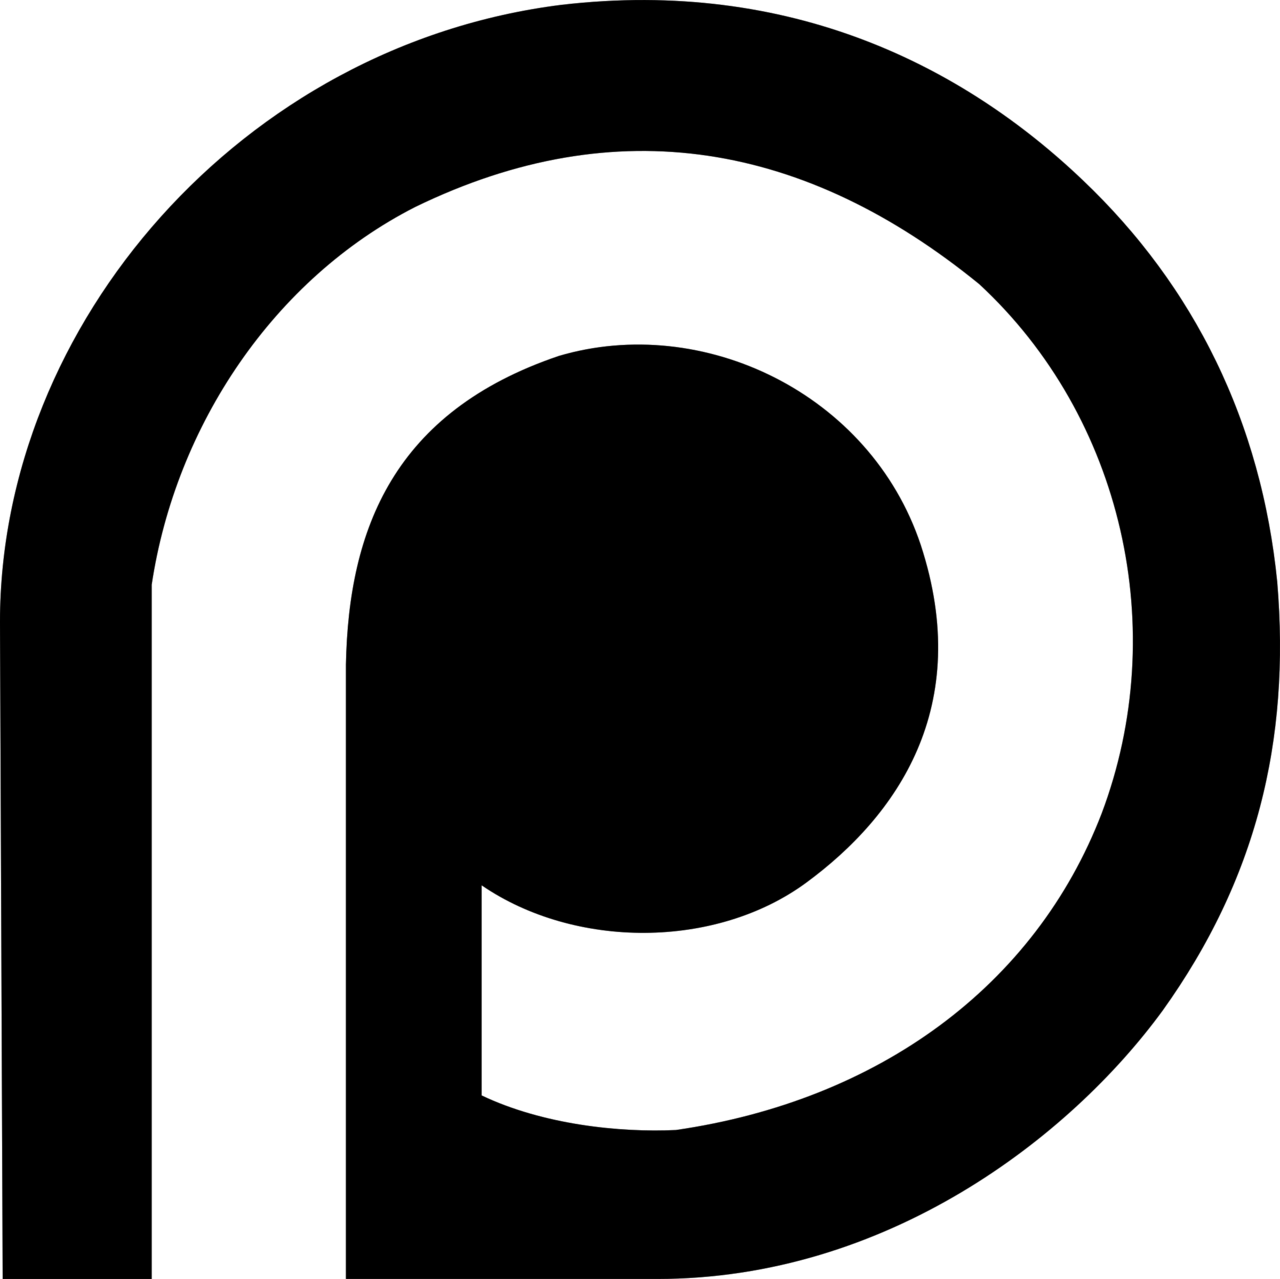 Patreon Logo Black and White 20 – Brands Logos